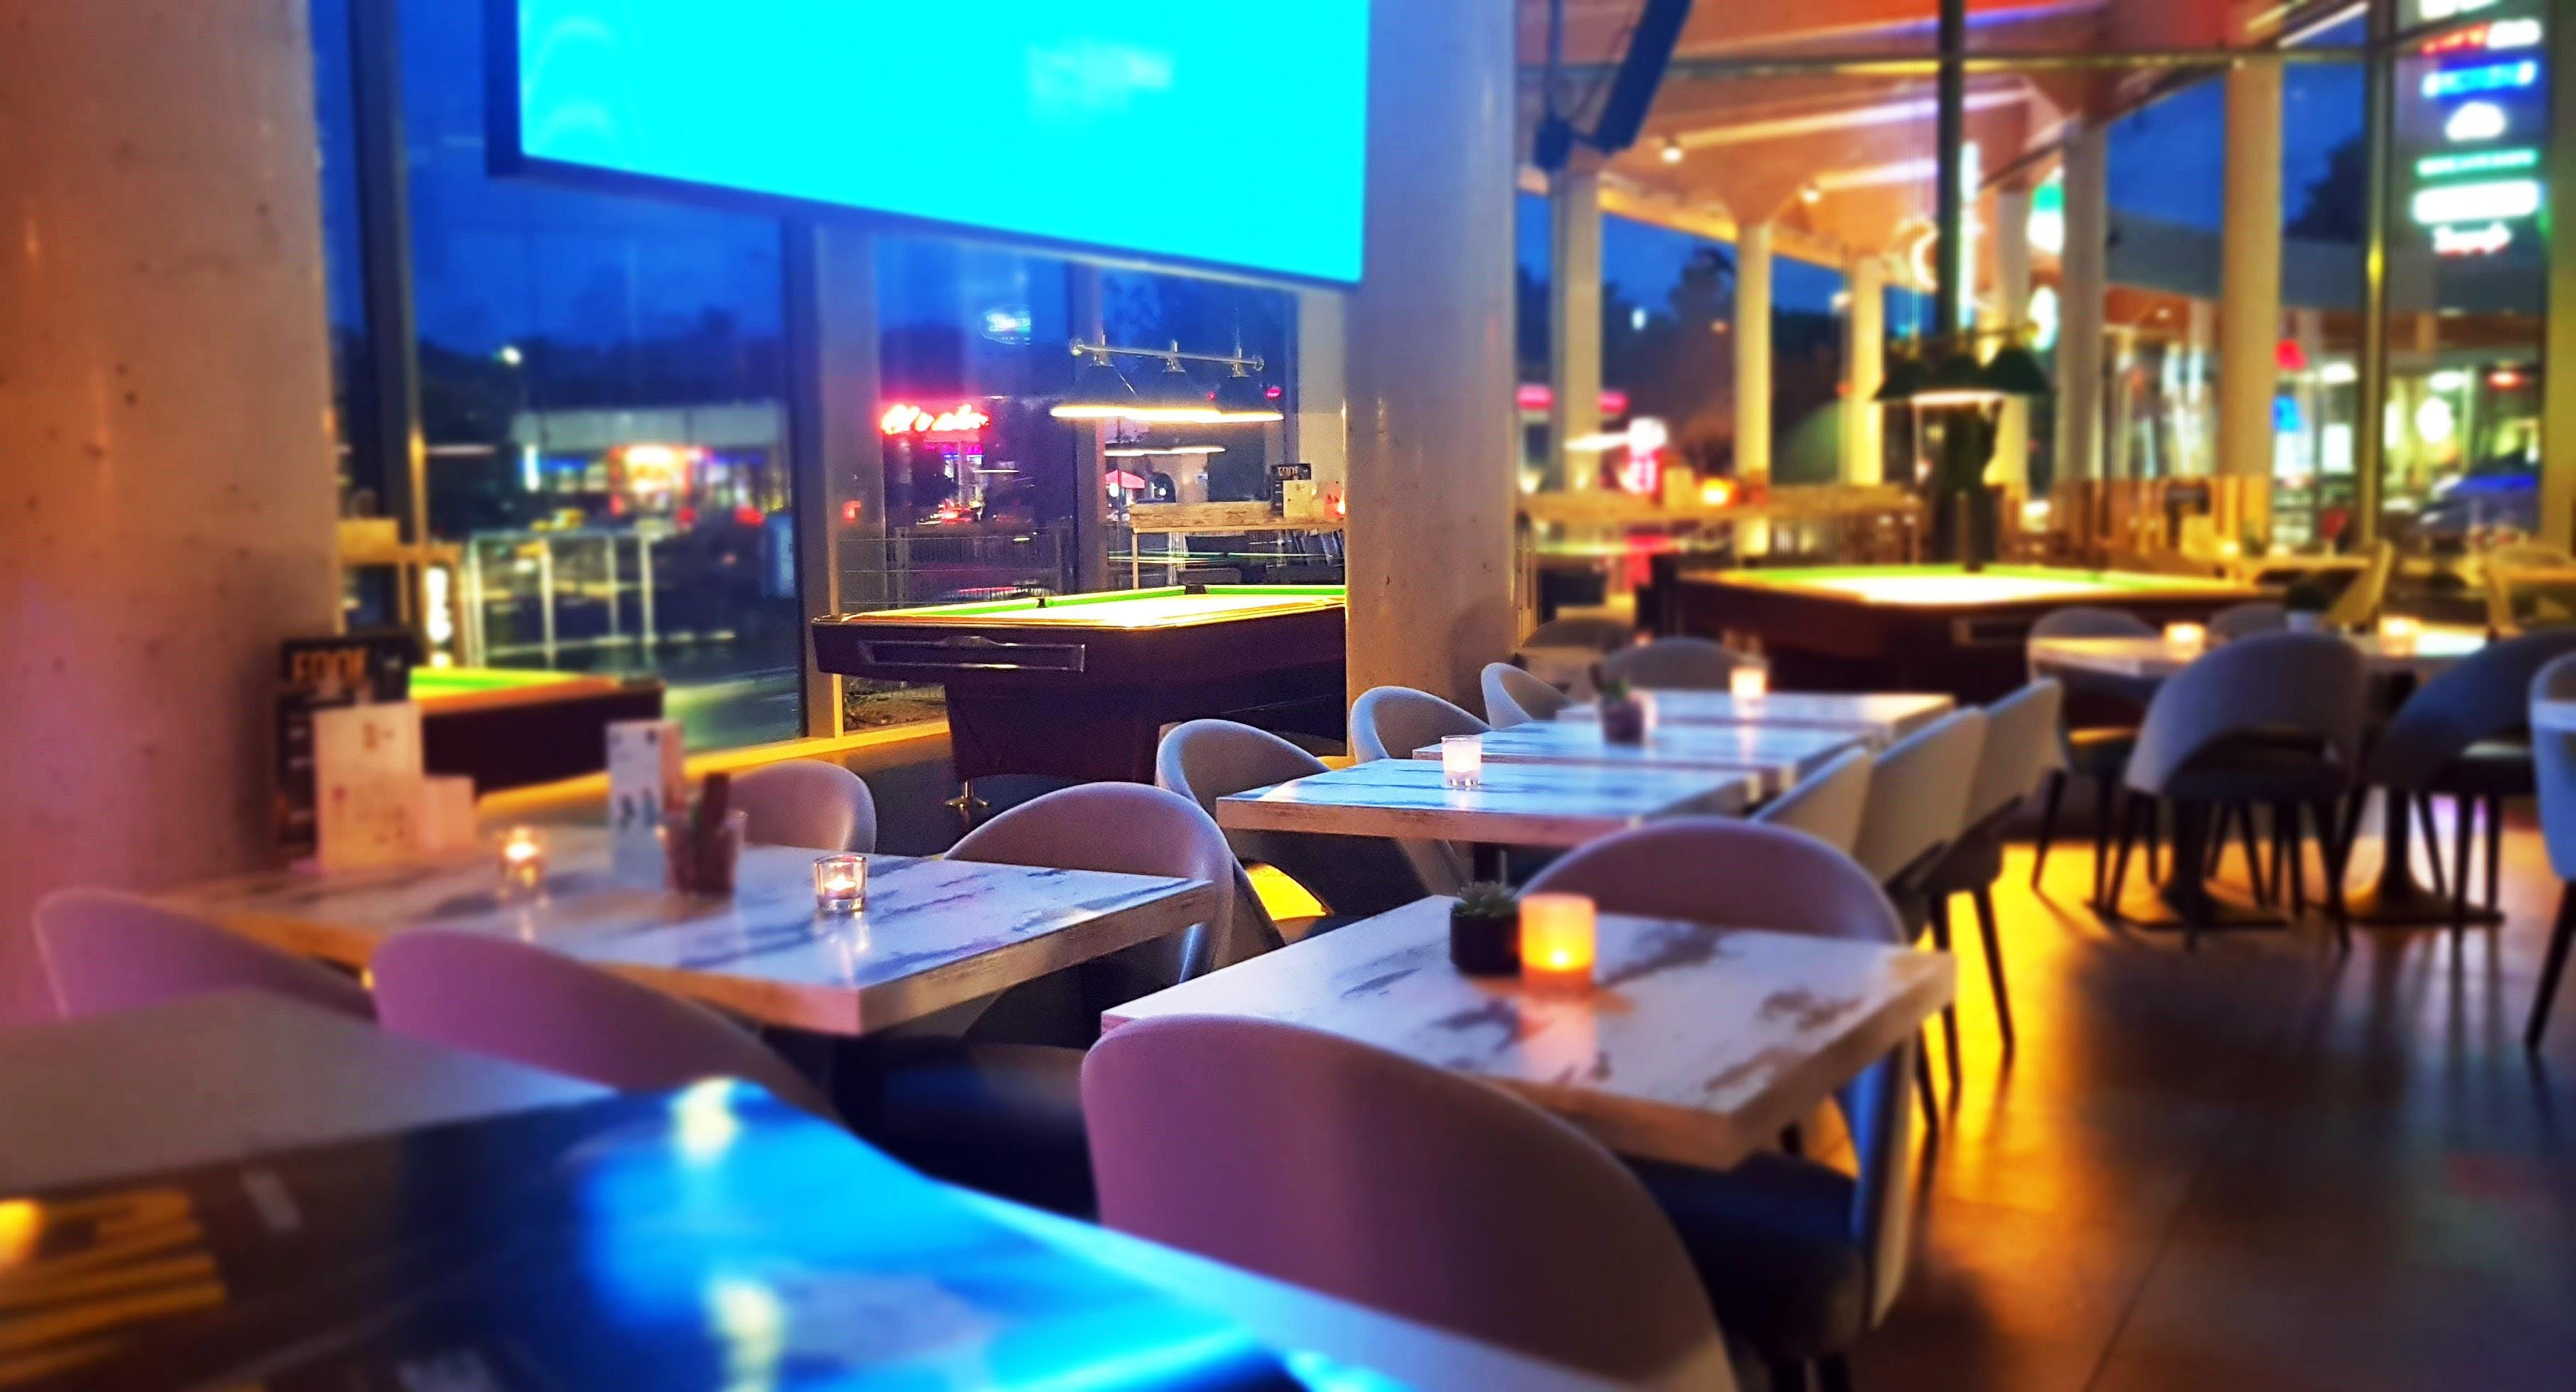 Rondo Restaurant & Sportsbar